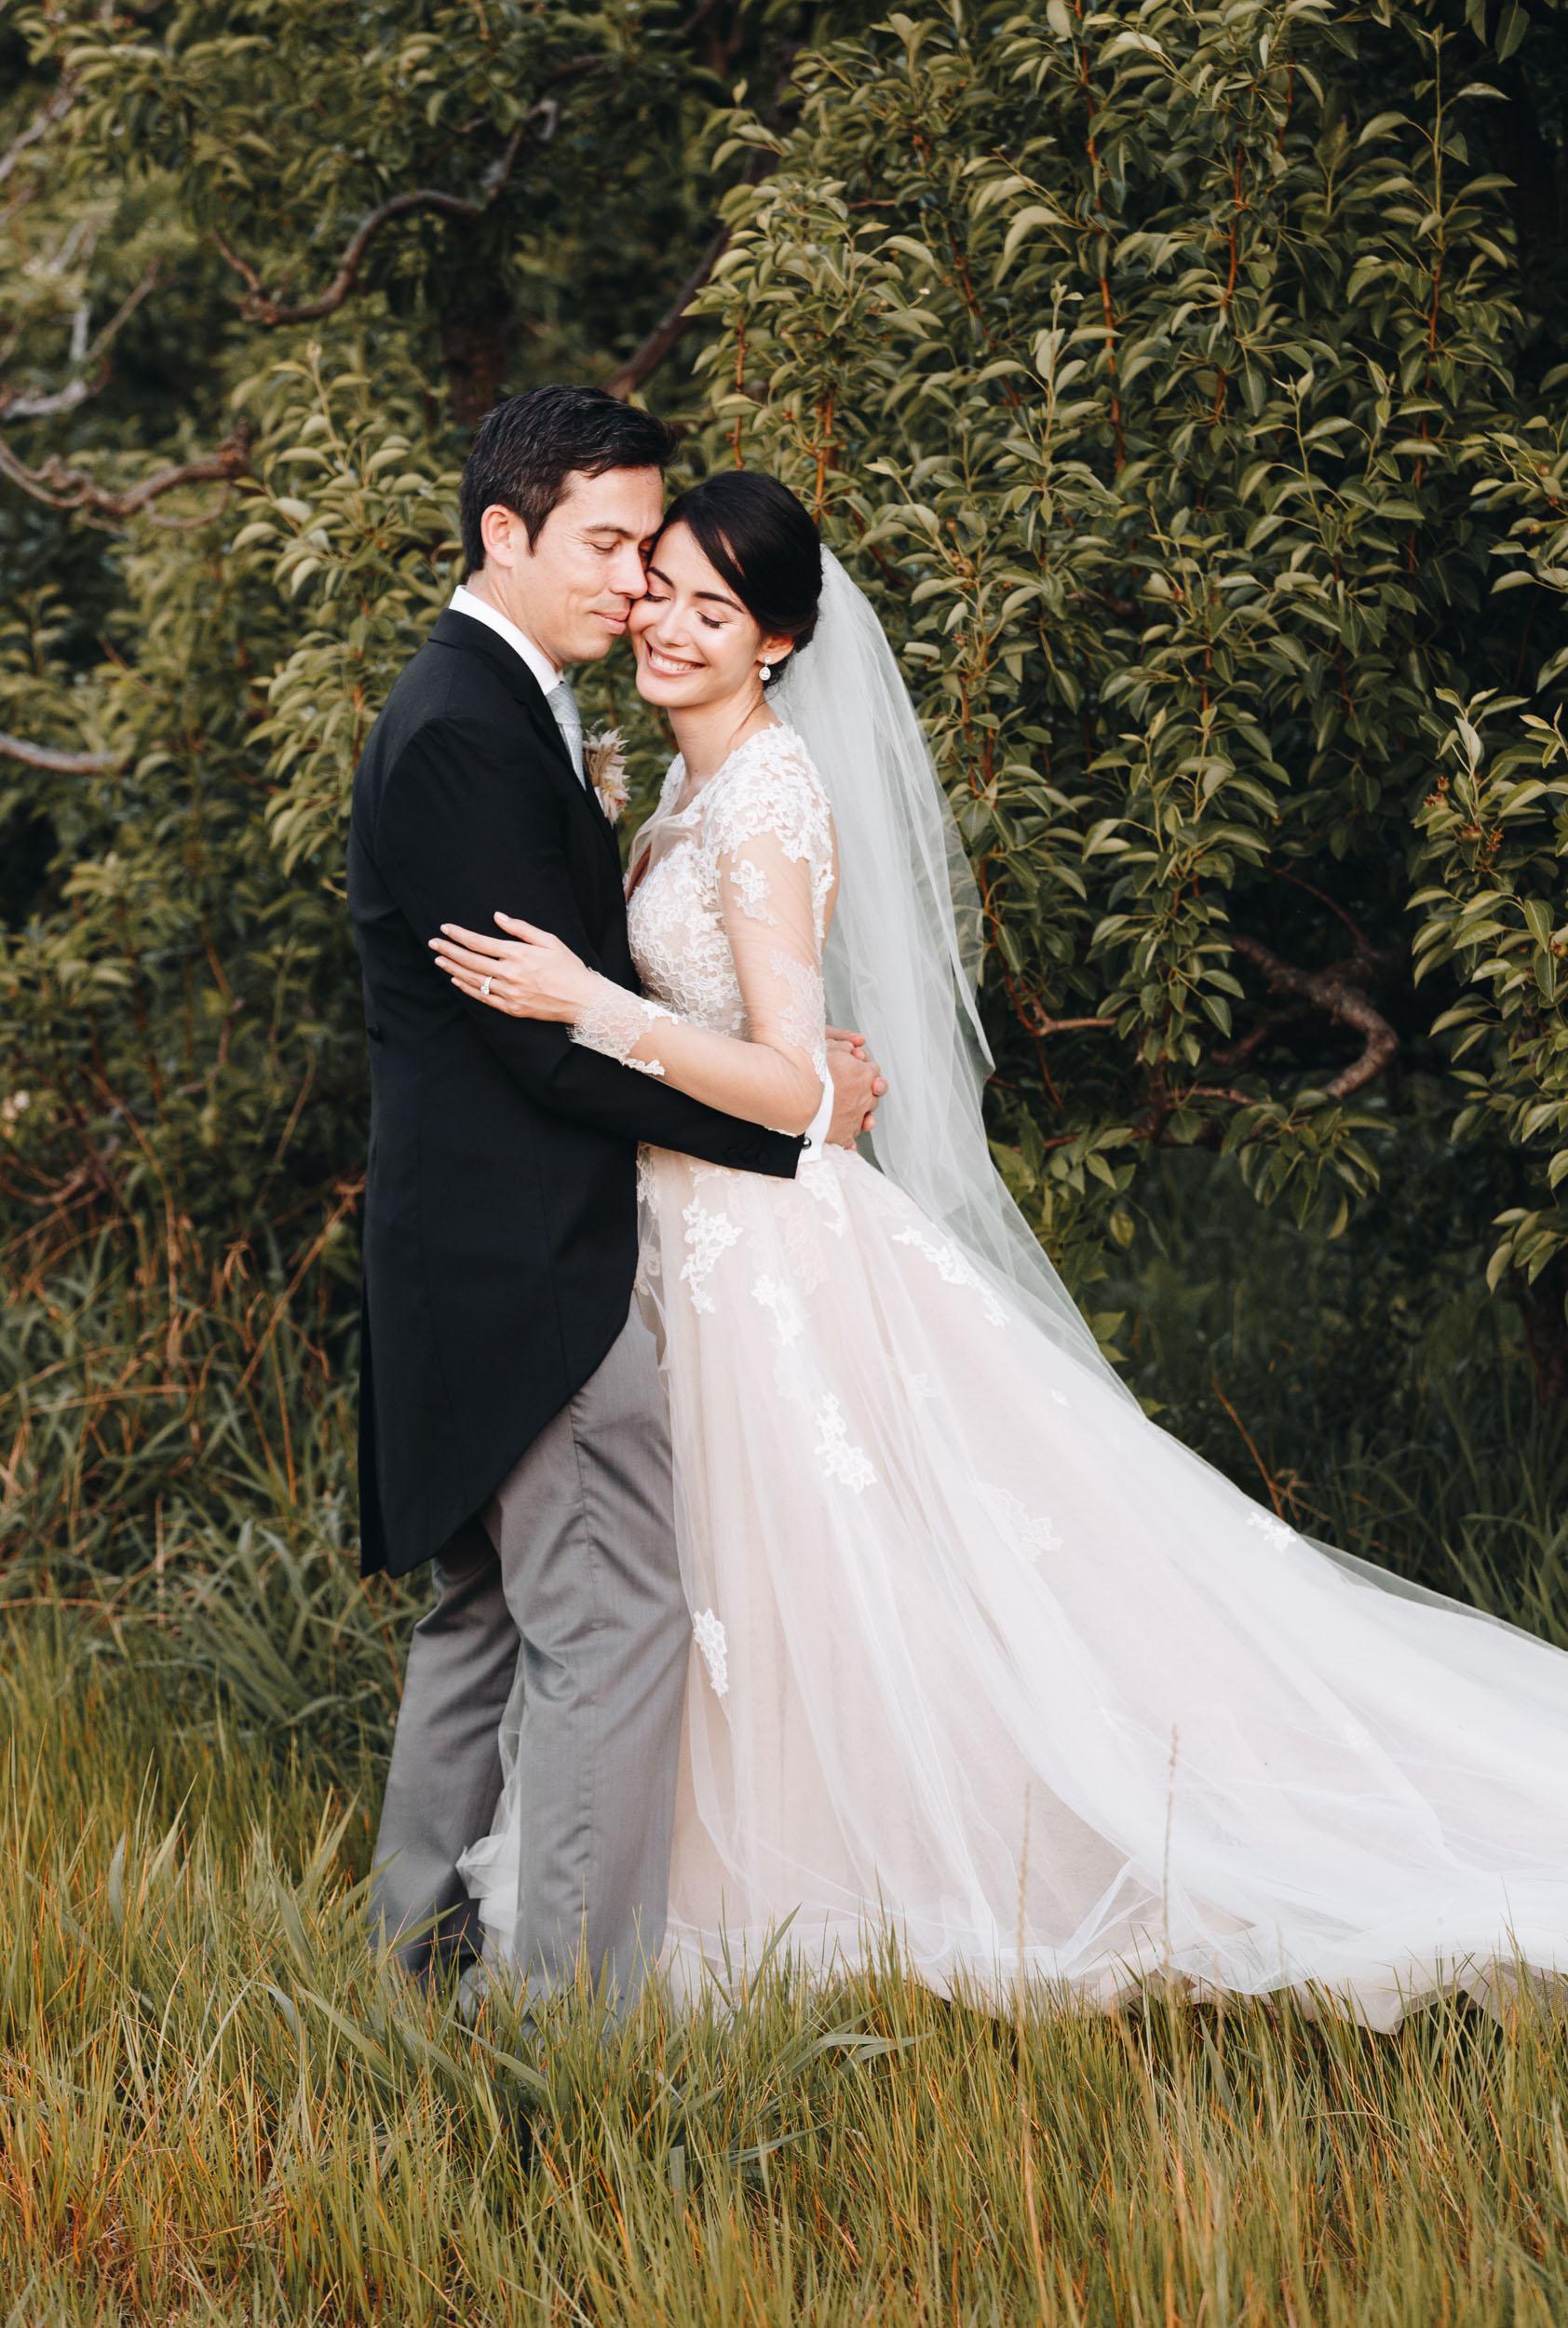 Jenny-Rockett-John-Scranton-Cape-Town-Wedding-Photographer-Andrea-Kellan-189.jpg